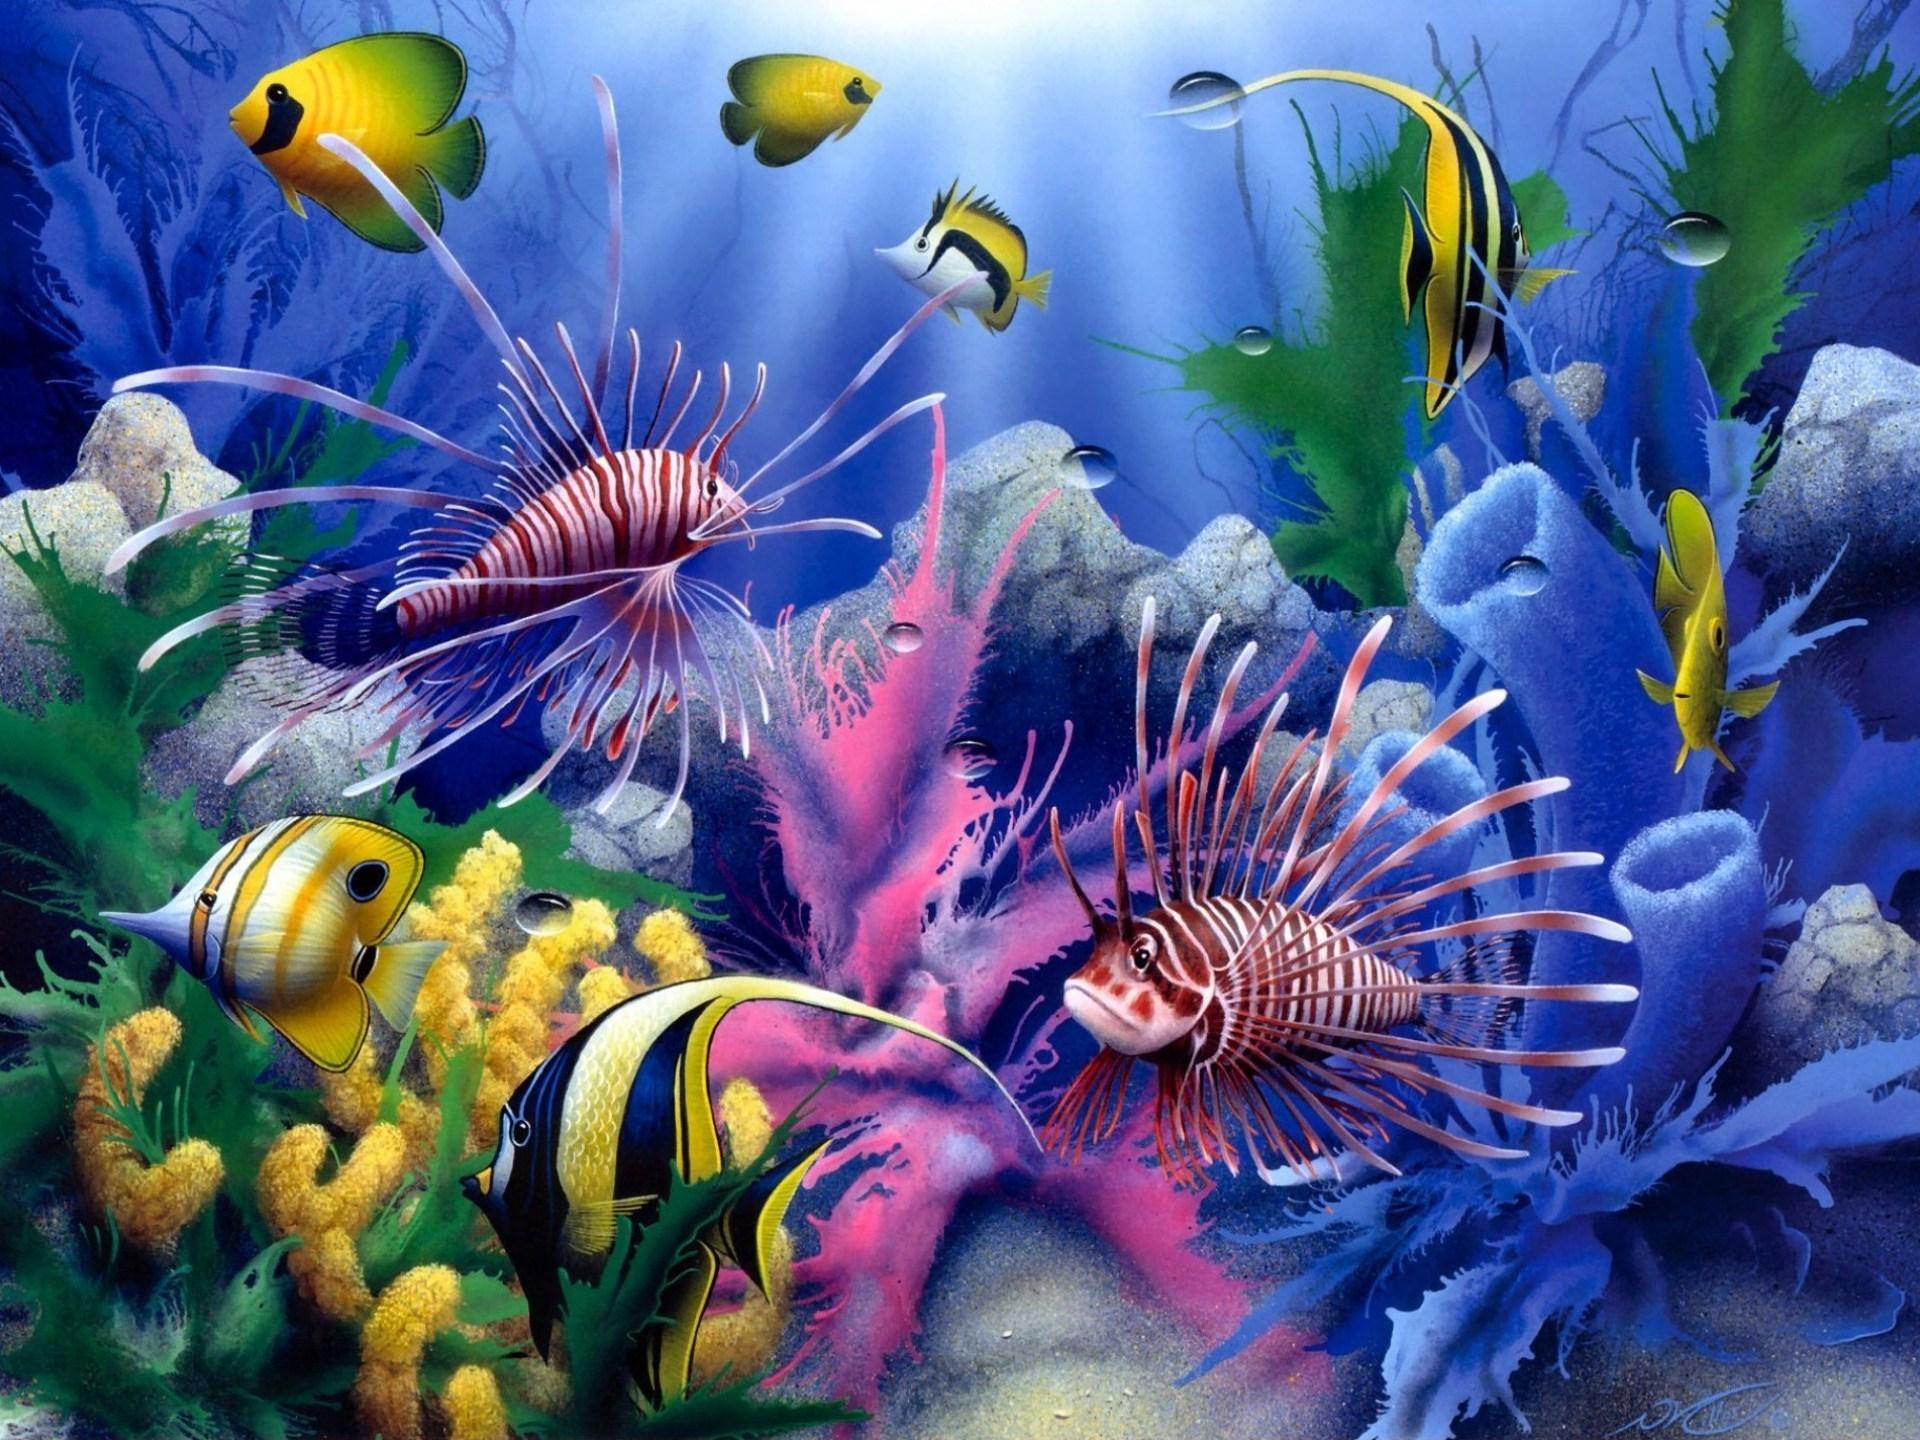 color underwater coral reef ocean sea sunlight wallpaper background 1920x1440